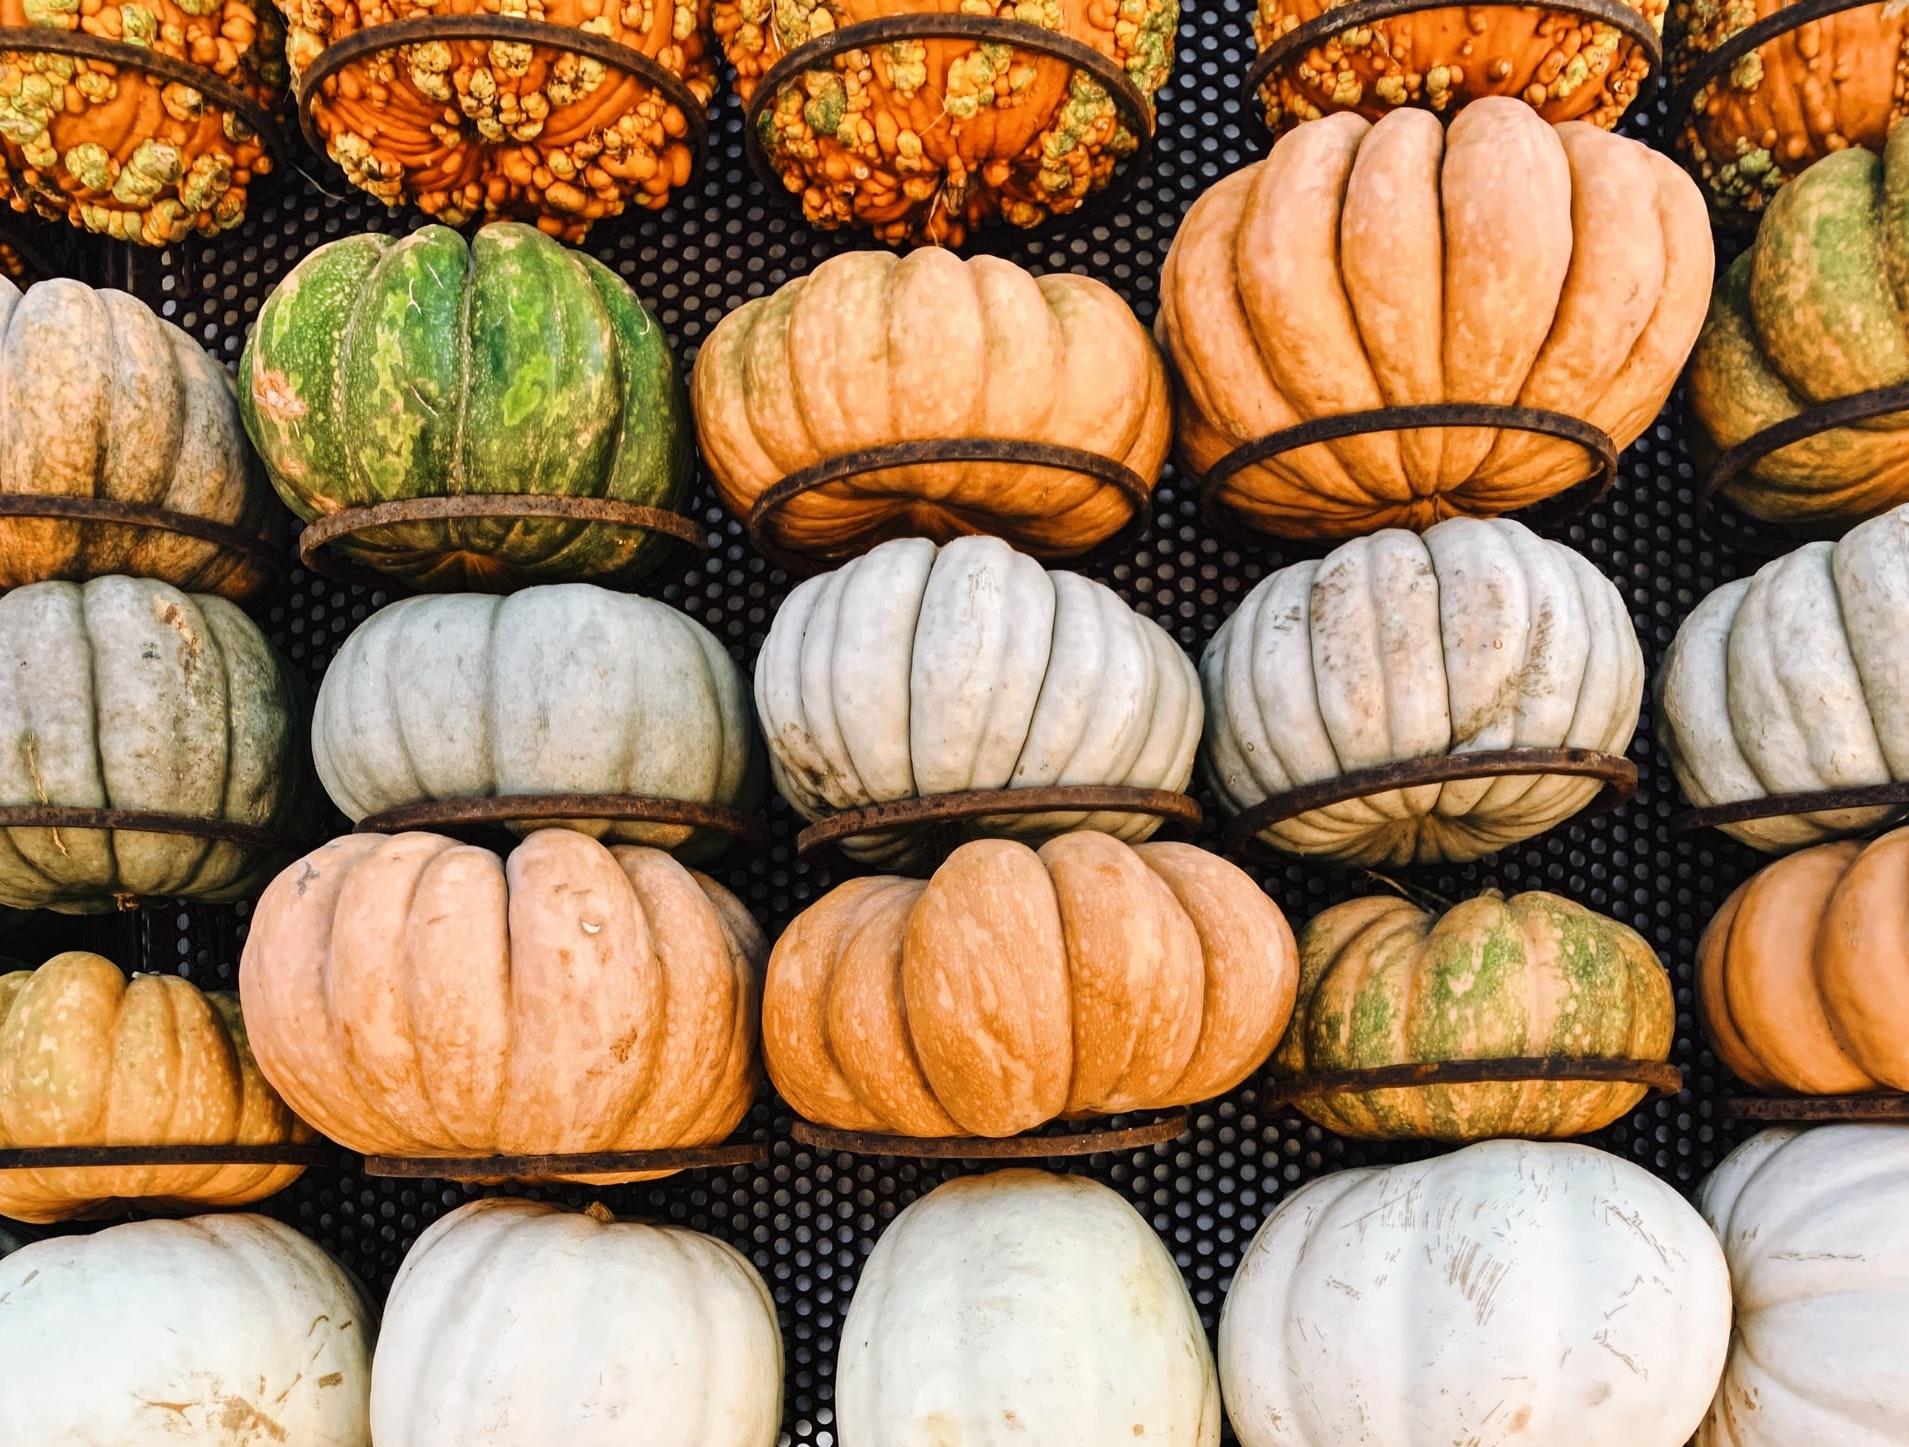 gourds at the Dallas arboretum fall festival